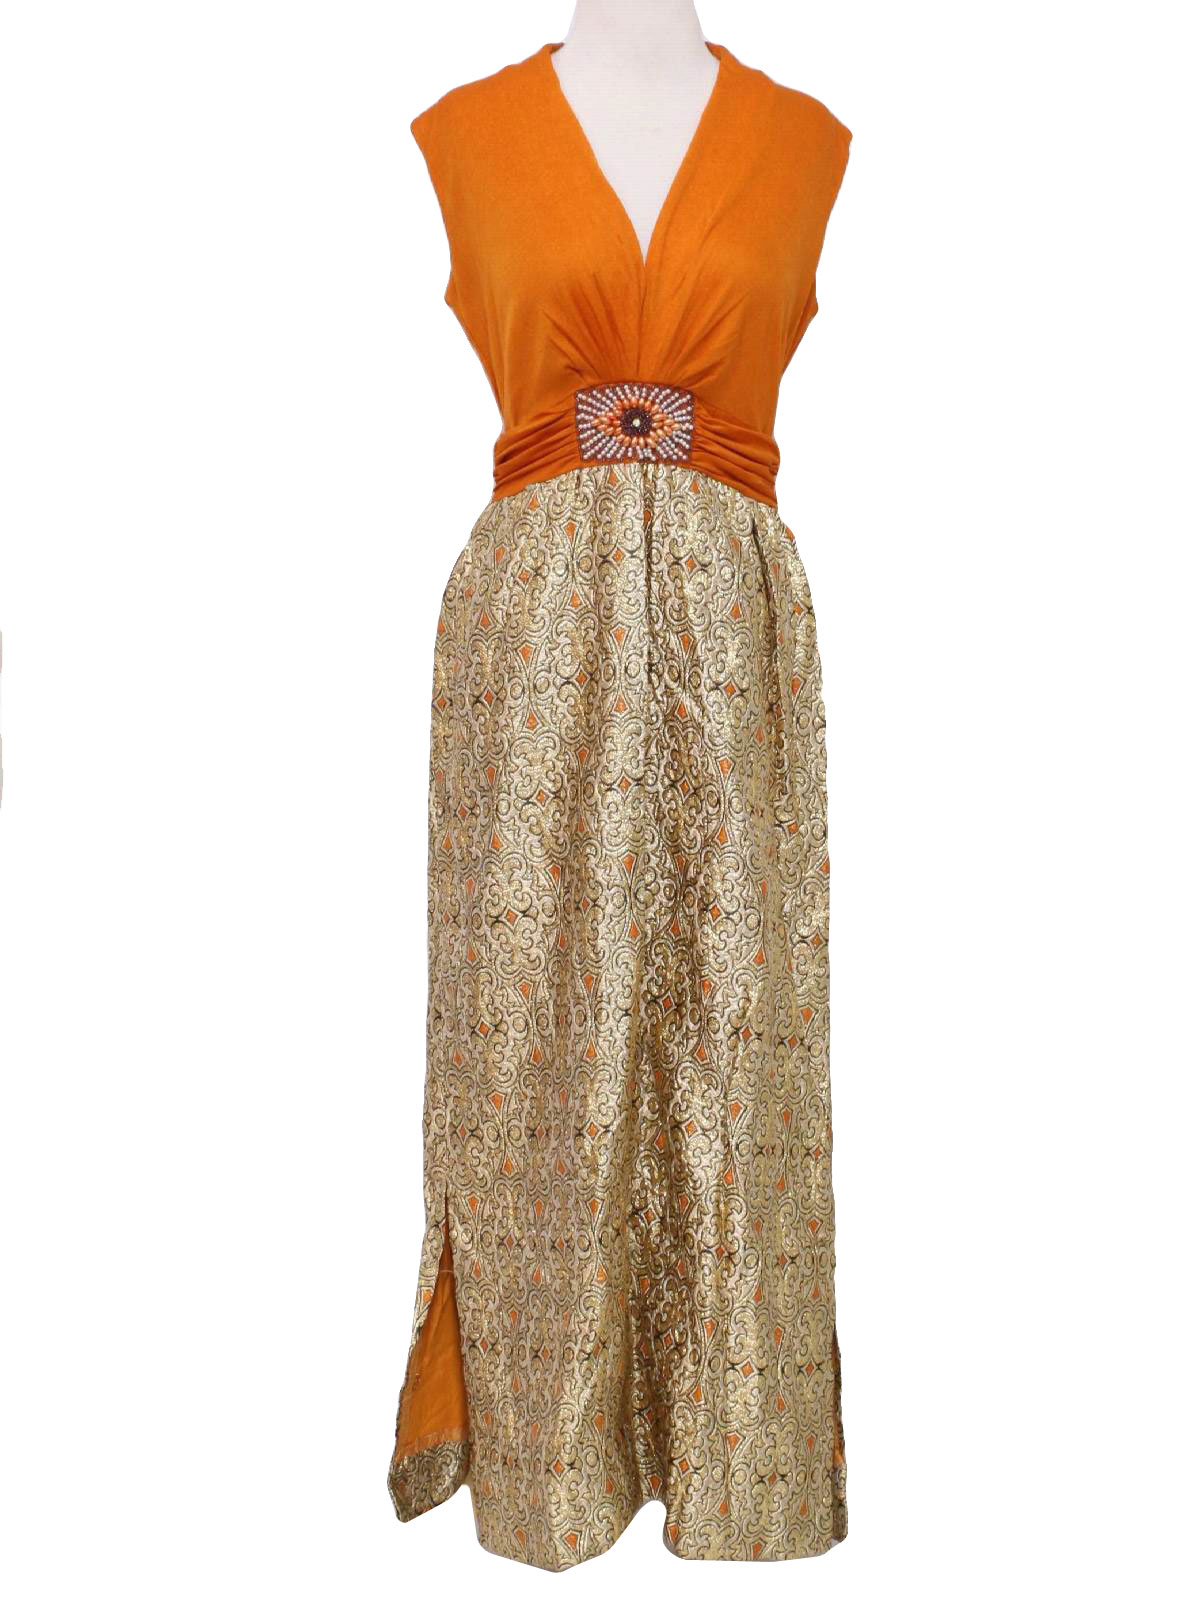 Seventies Vintage Cocktail Dress: 70s -Missing